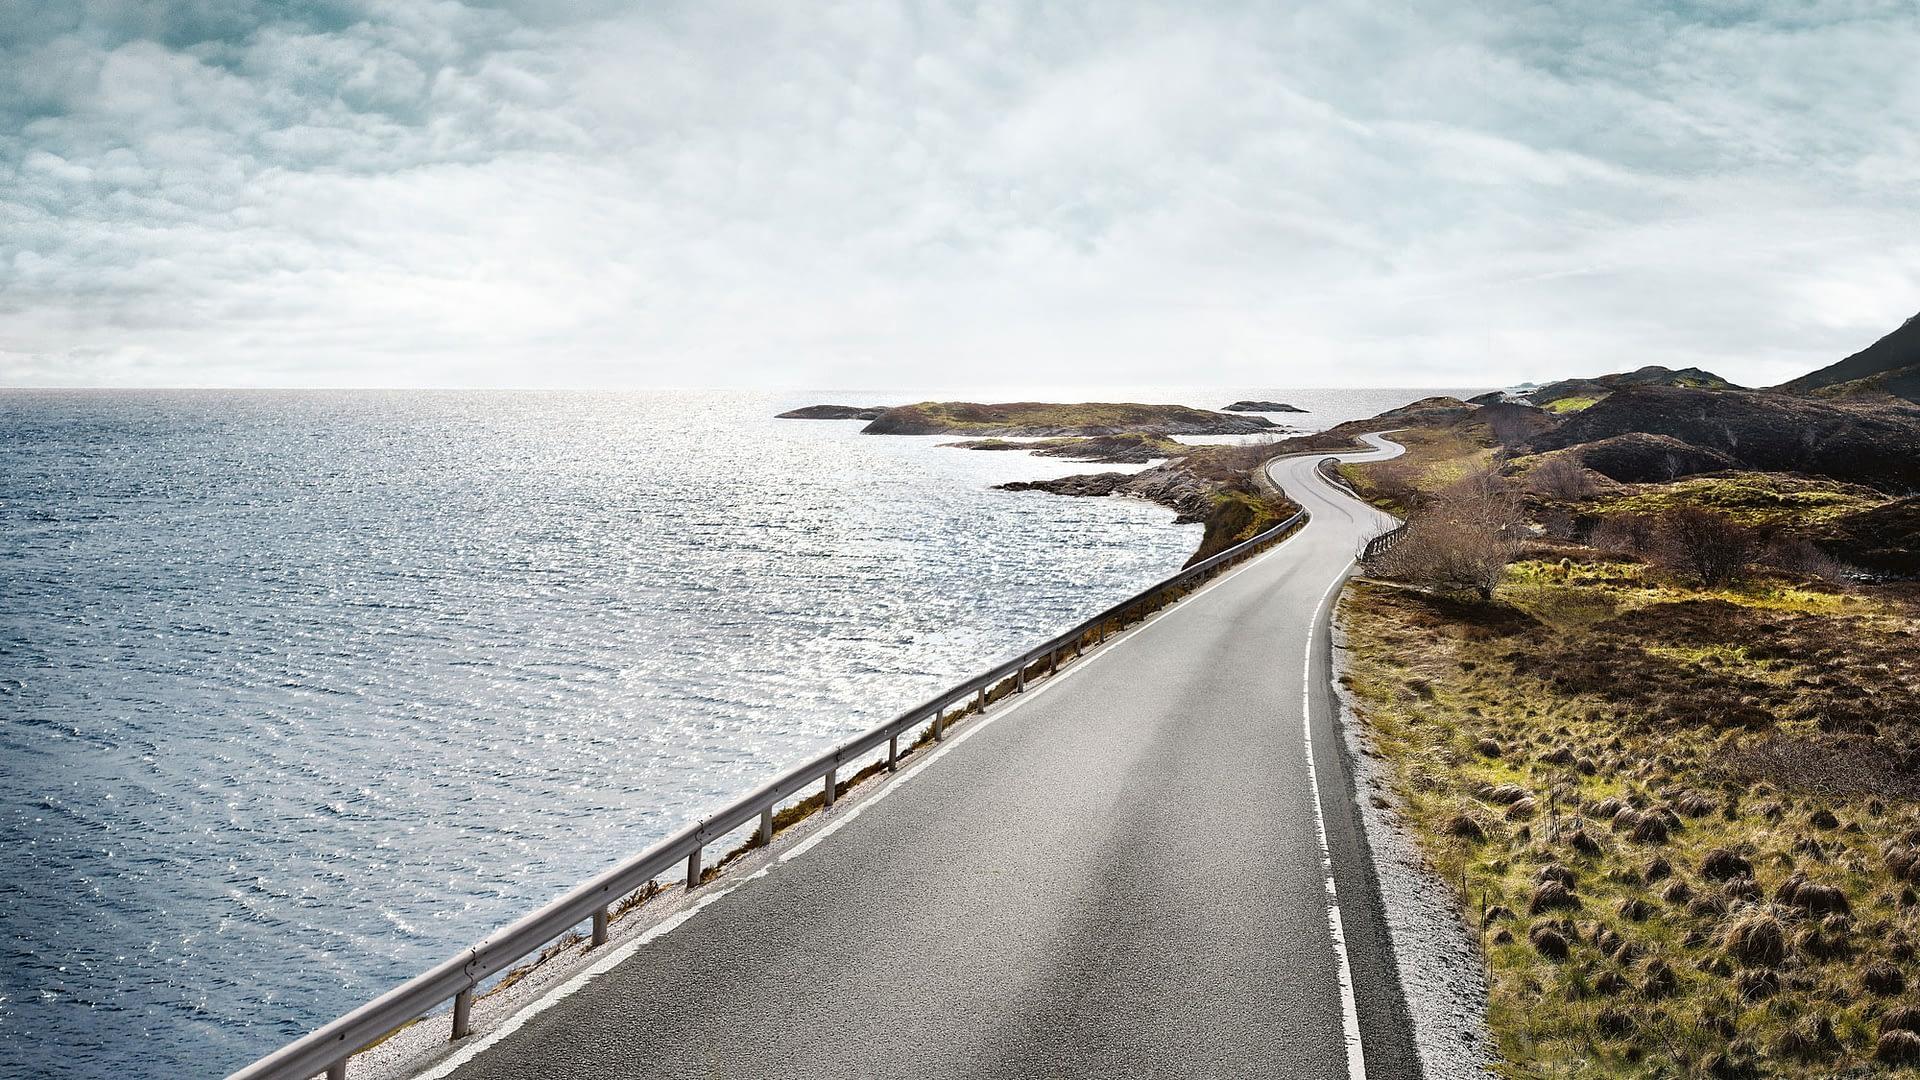 Vei langs sjøen